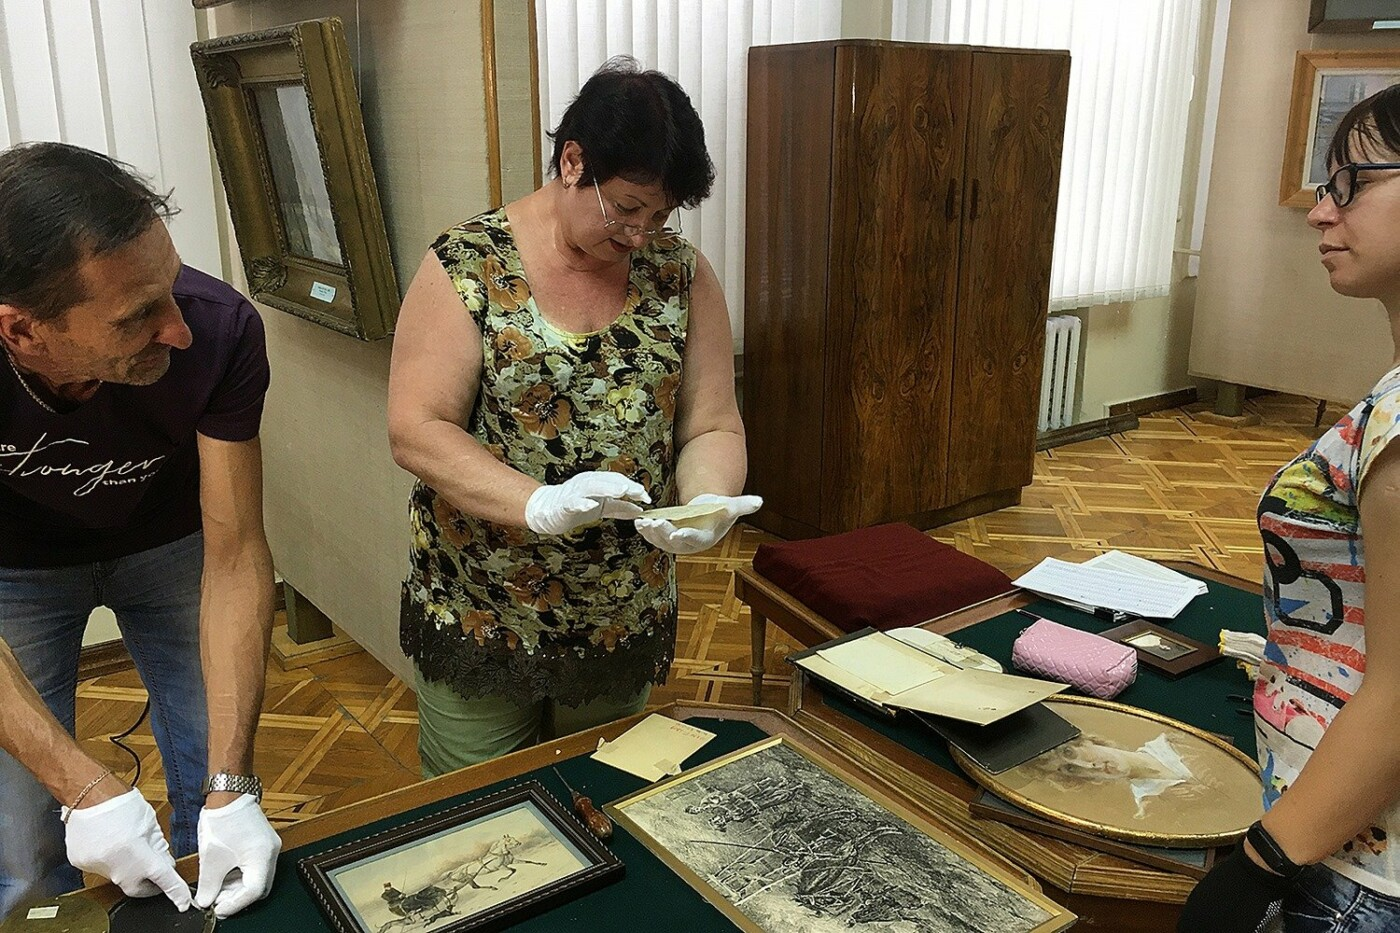 В Николаеве оцифруют и создадут  3D модели из экспонатов музея имени  Верещагина, - ФОТО , фото-2